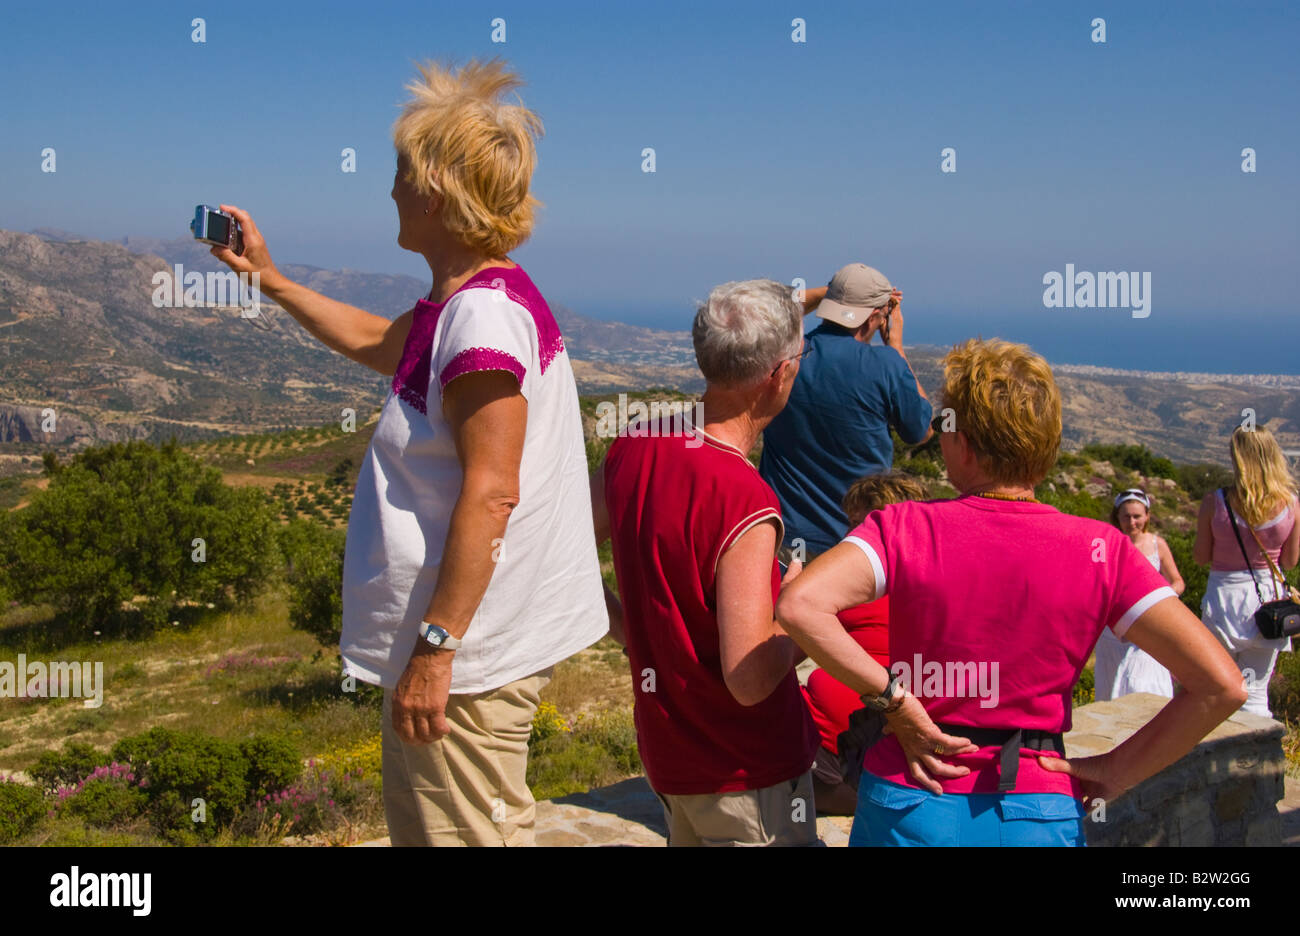 Tourists take photographs at mountain viewpoint near village of Kalamafka on the Greek Mediterranean island of Crete Stock Photo